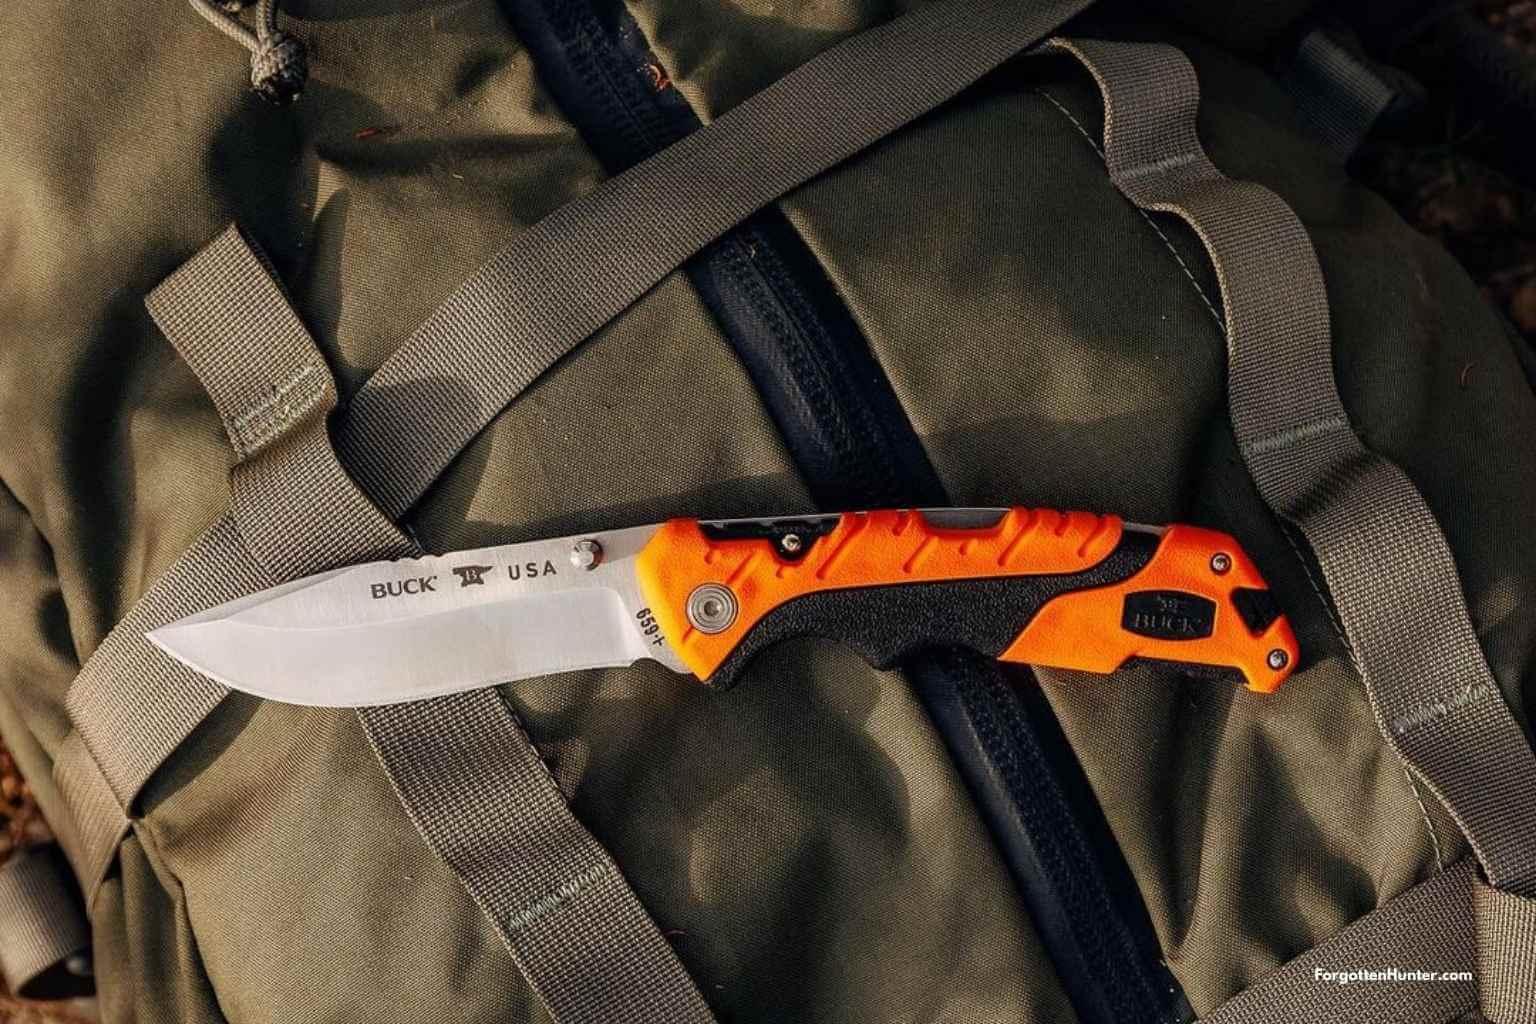 Buck Pursuit Pro Series - Knife Reviews [Fixed & Folders]